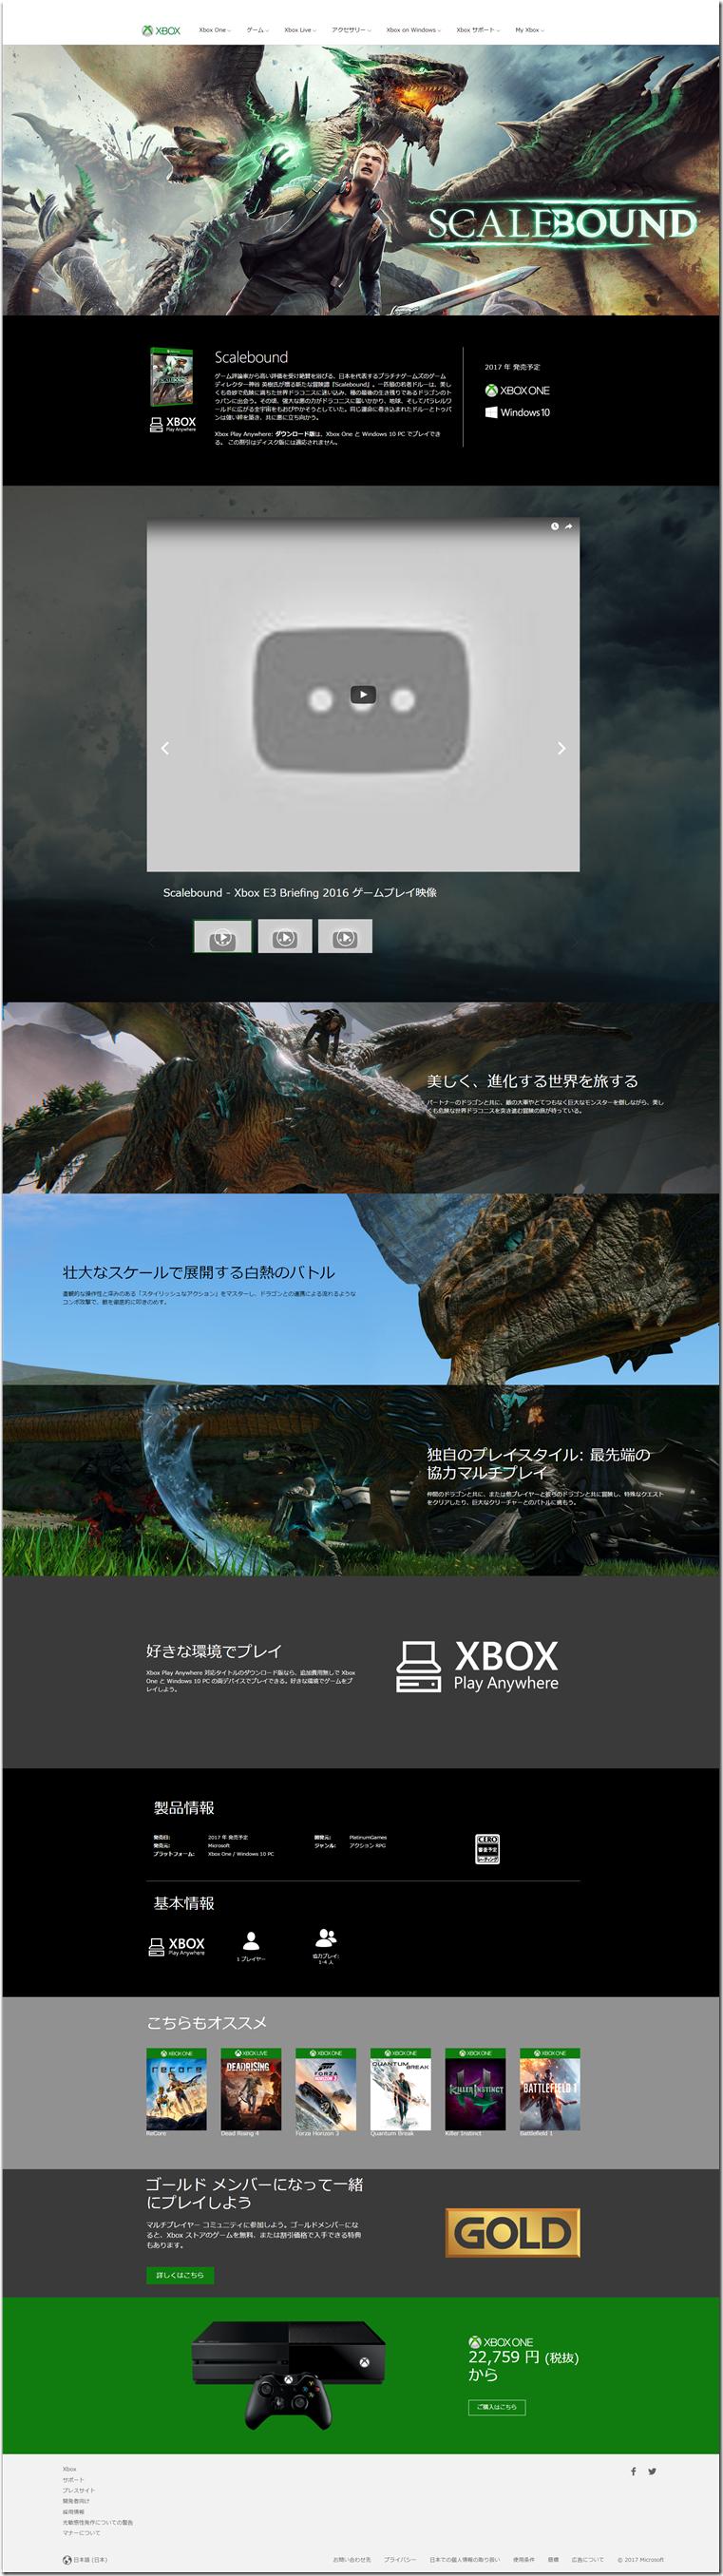 FireShot Capture 2 - Scalebound I Xbox_ - http___webcache.googleusercontent.com_search